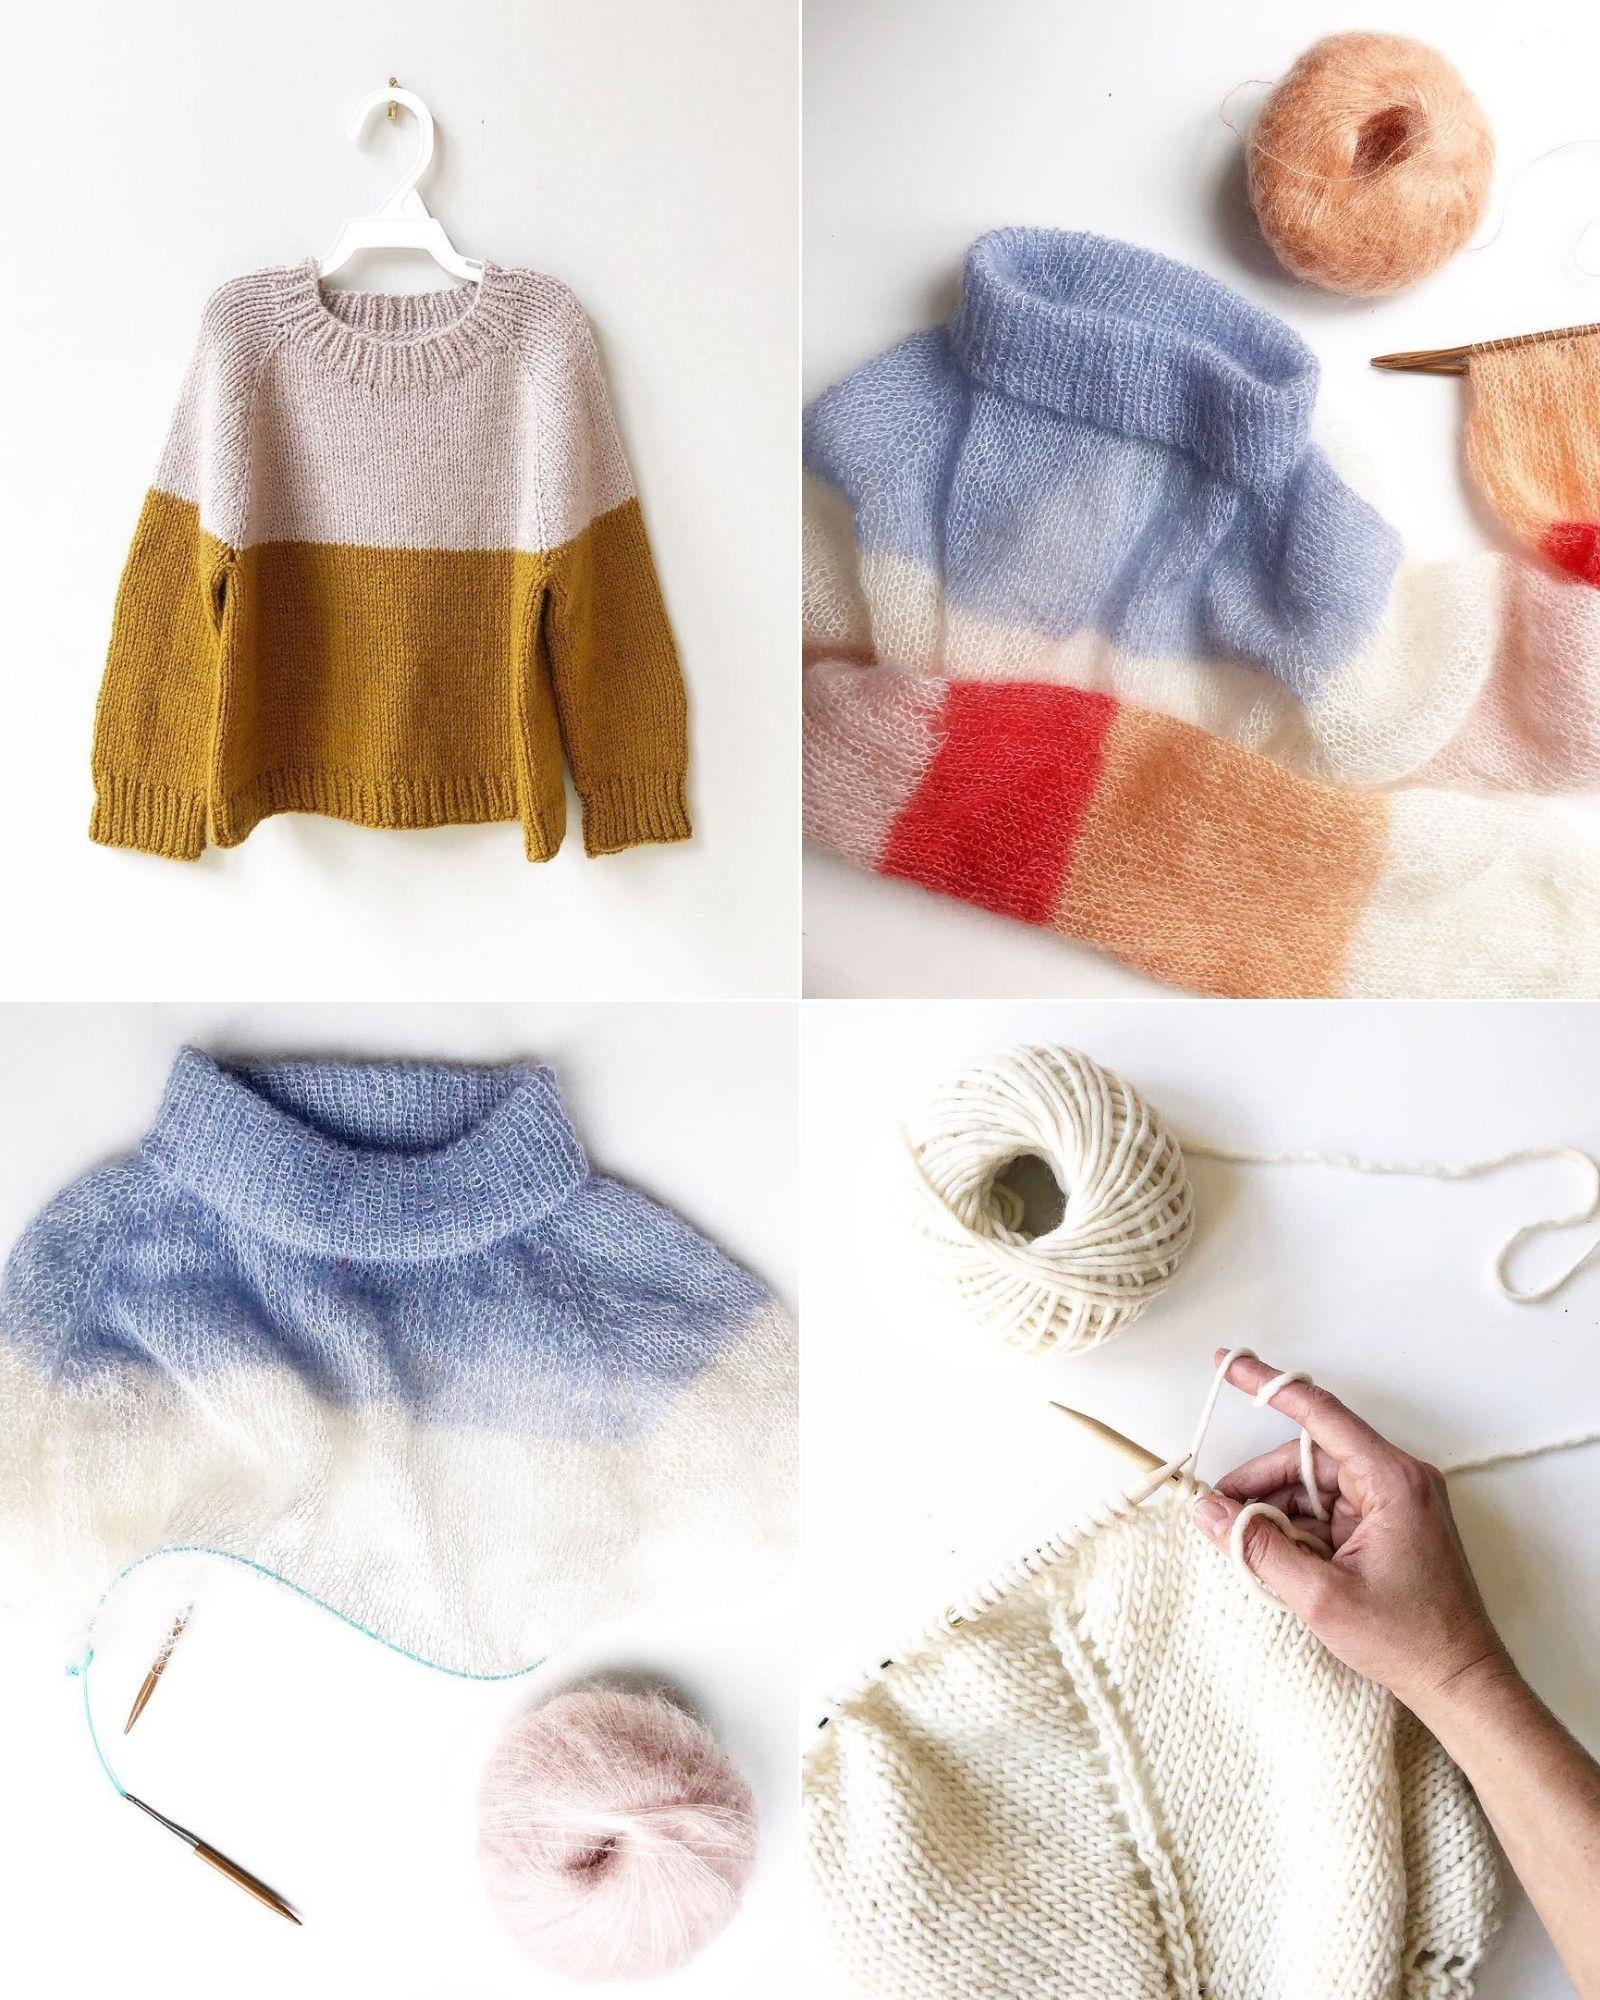 Tài khoản Instagram @maisondene truyền cảm hứng đan len